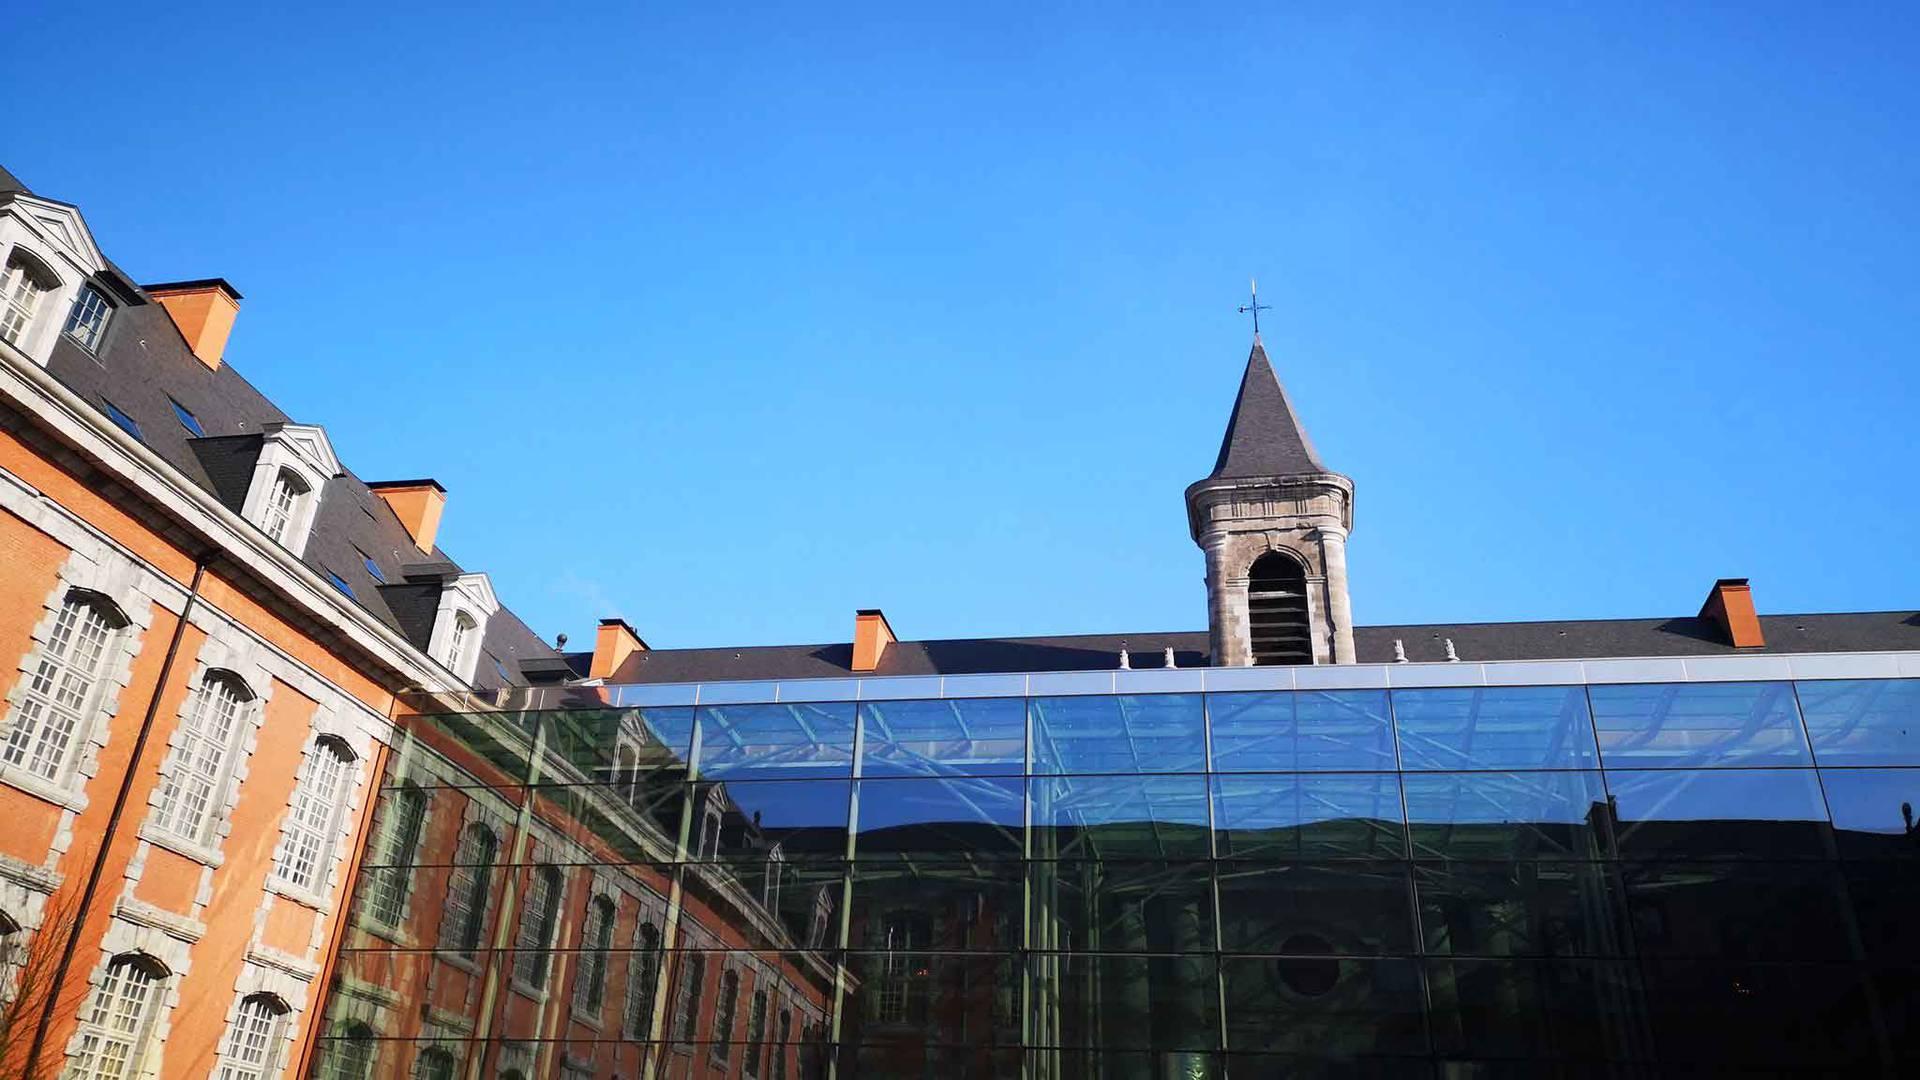 Valenciennes Royal Hainaut spa & resort, la cour